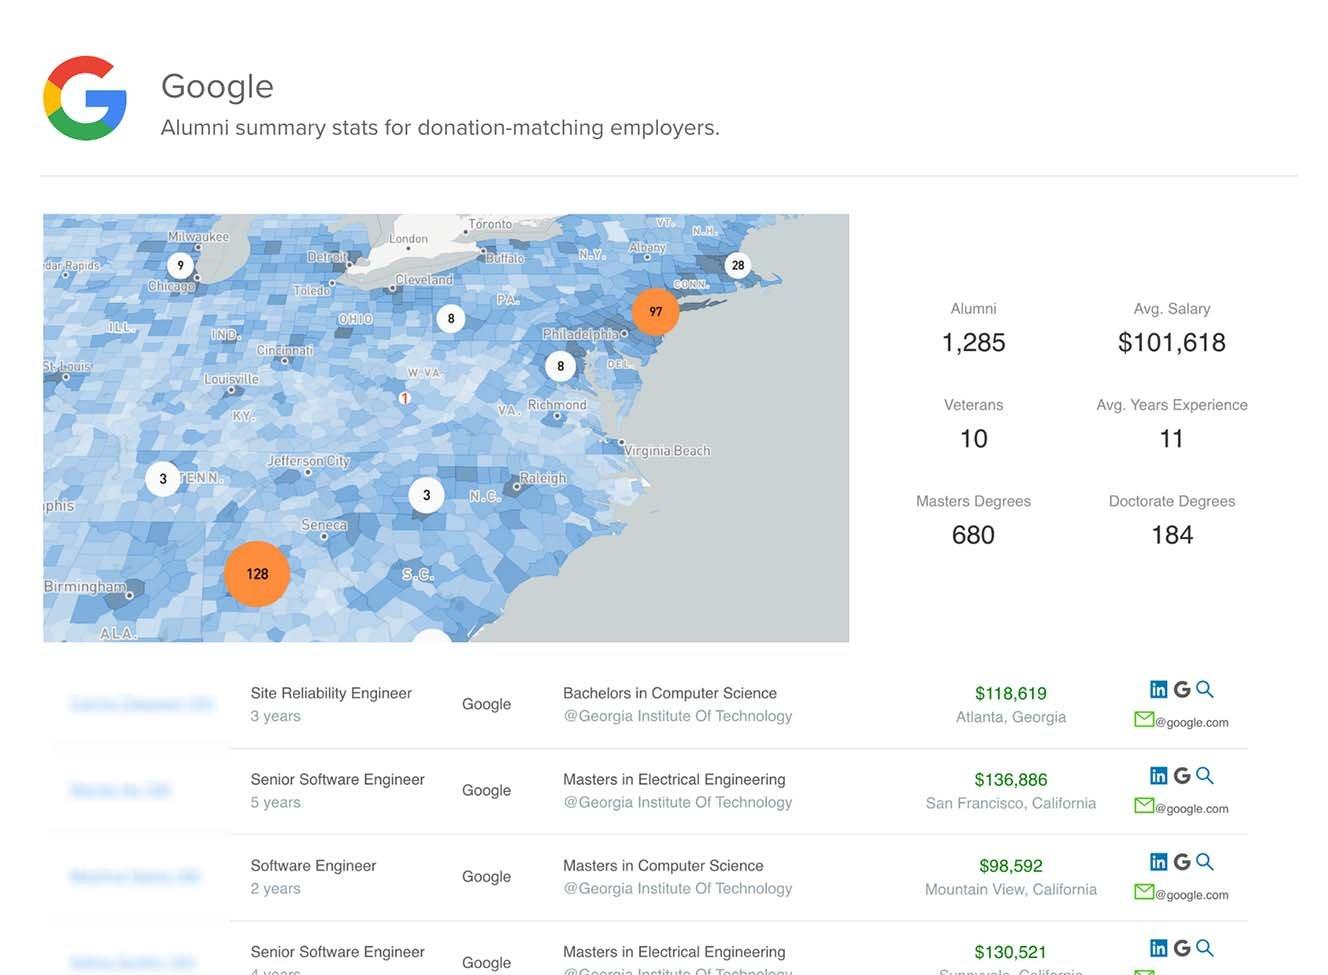 Steppingblocks Donation Matching Employer Data